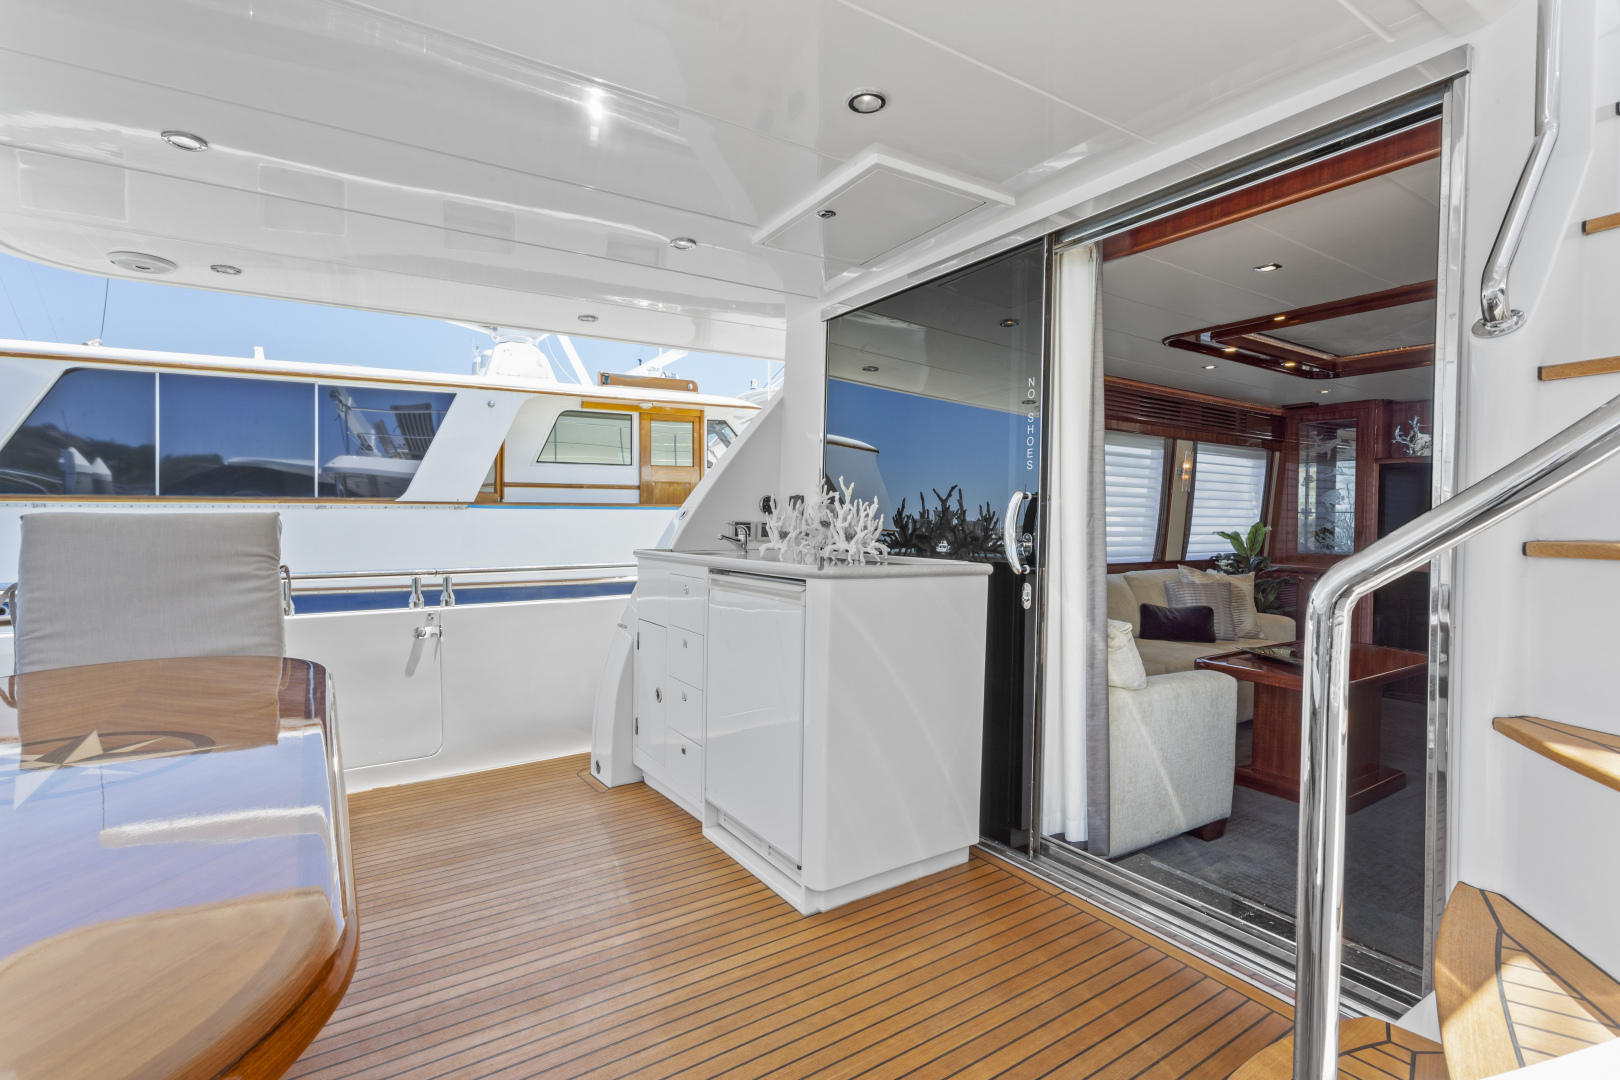 Hampton-76 Skylounge Motoryacht 2014-ODYSEA San Diego-California-United States-AFT DECK-1165182 | Thumbnail